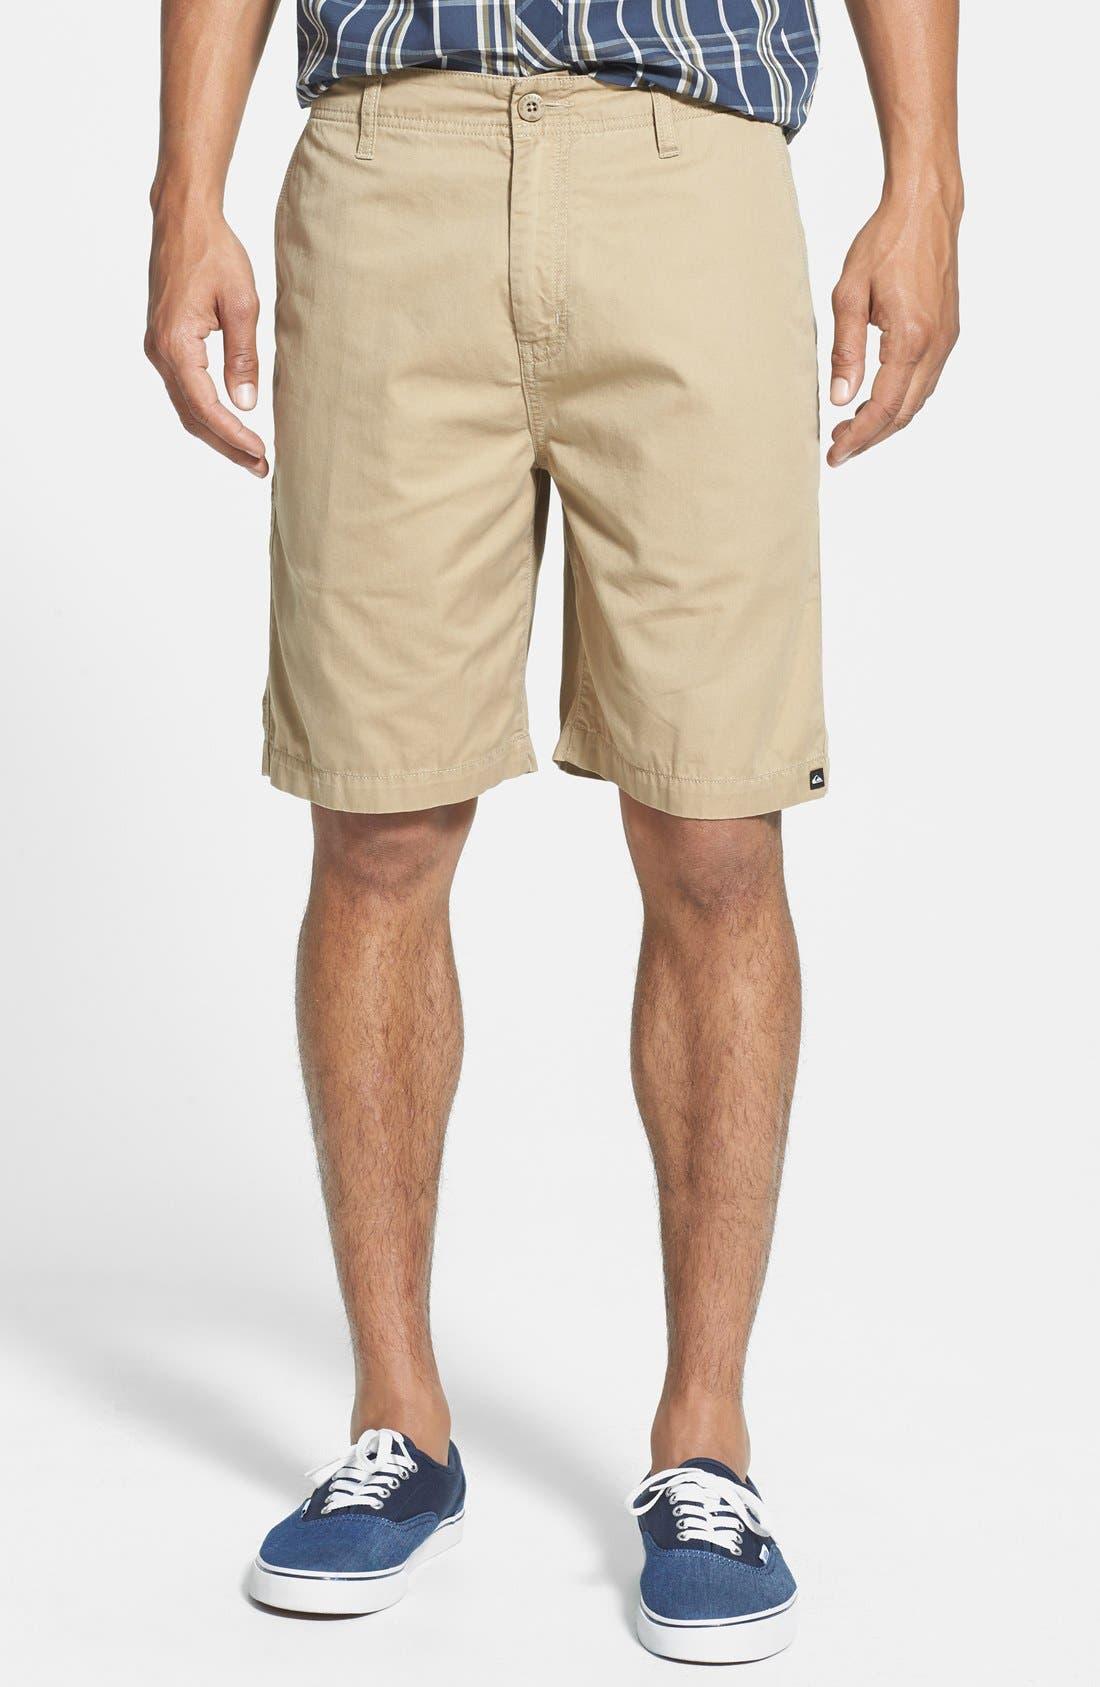 Alternate Image 1 Selected - Quiksilver 'Minor Road' Shorts